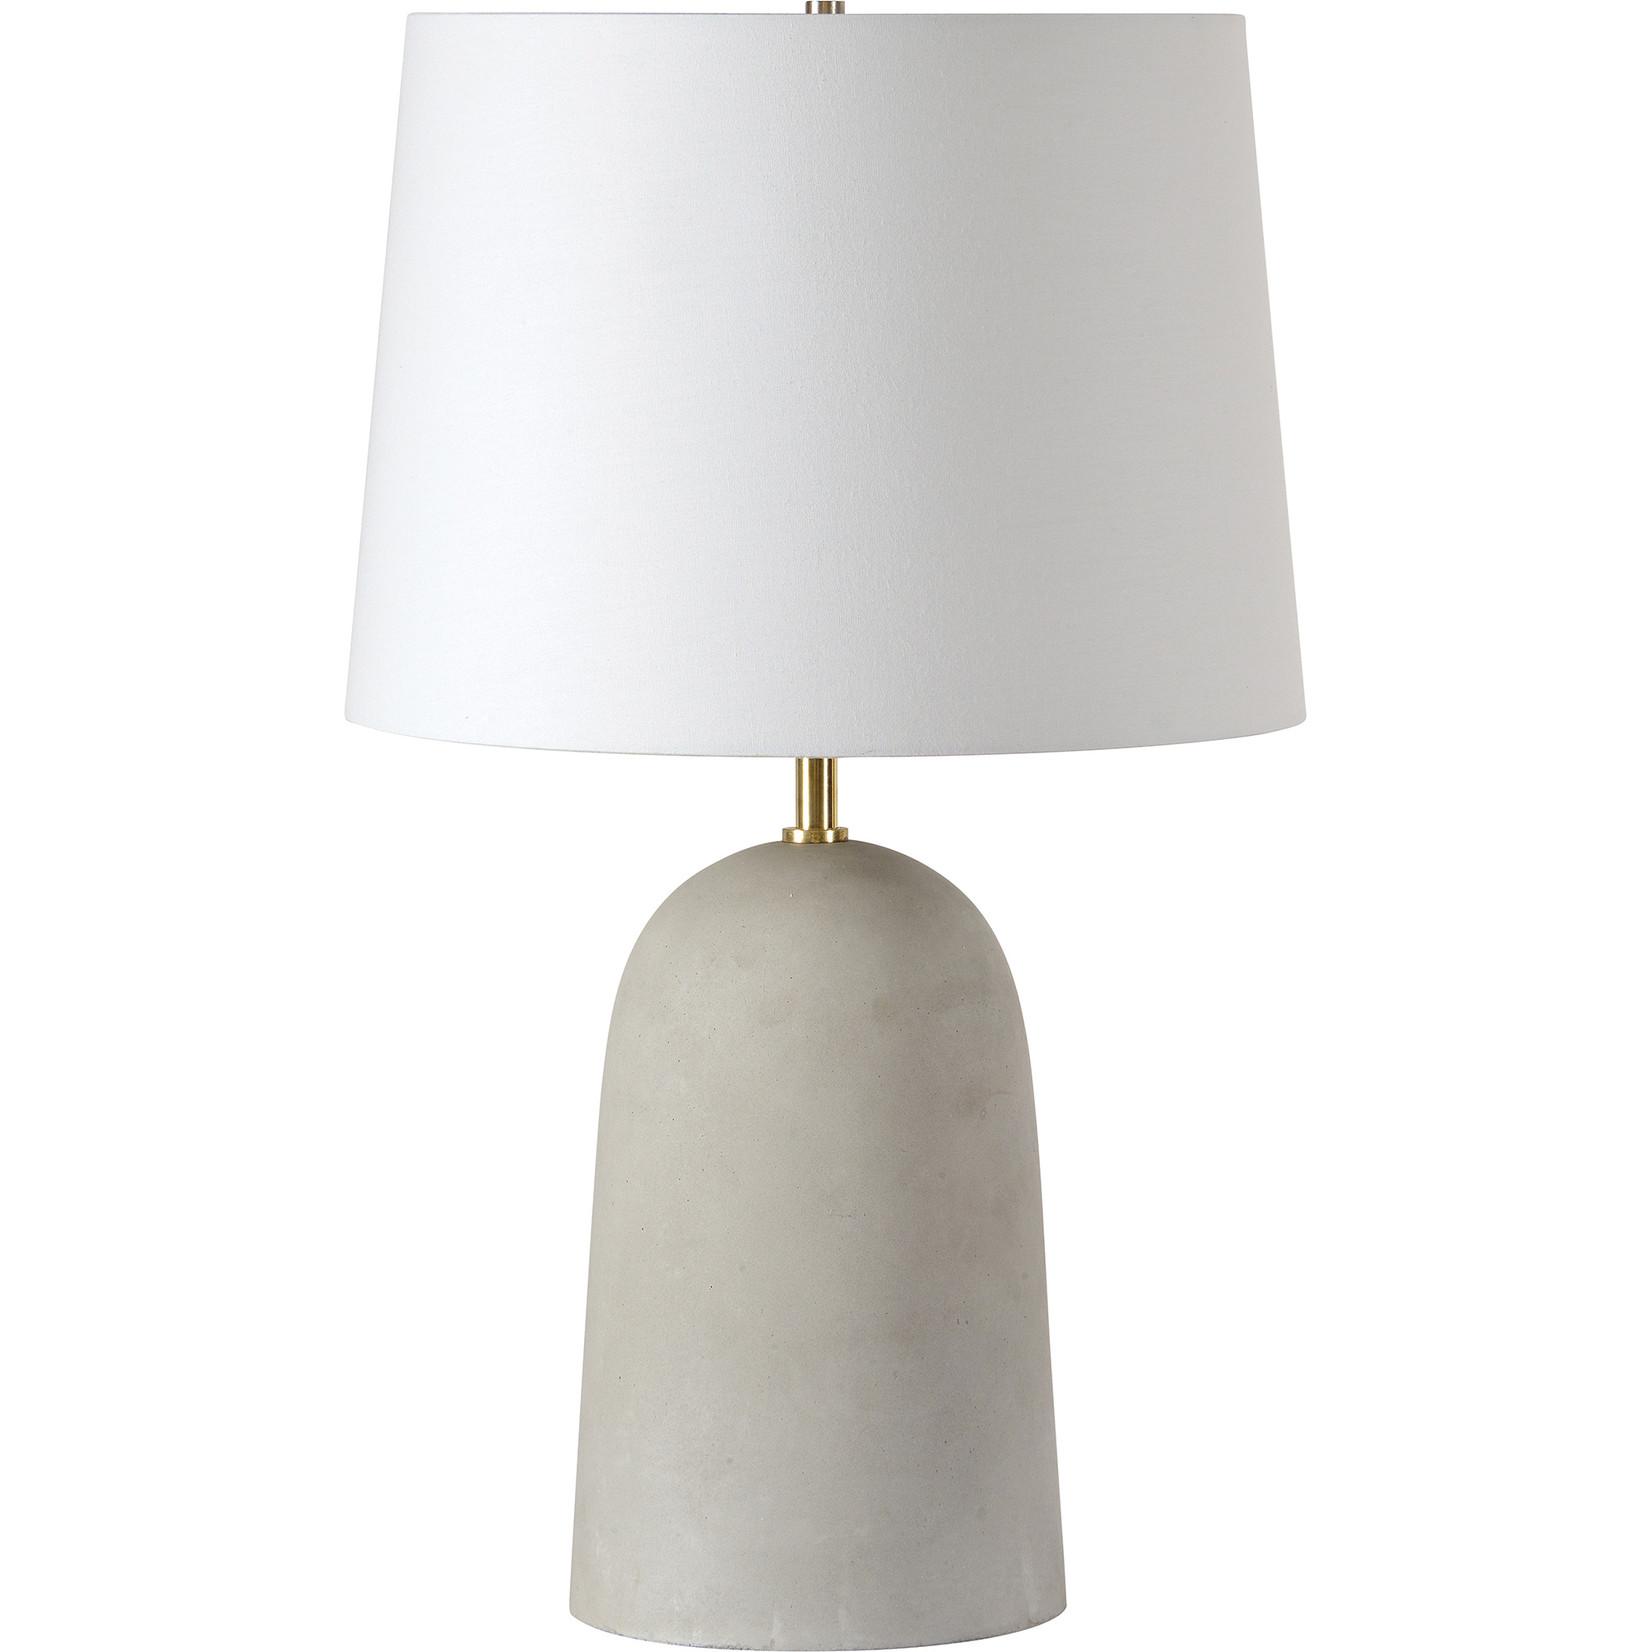 Montoya Table Lamp